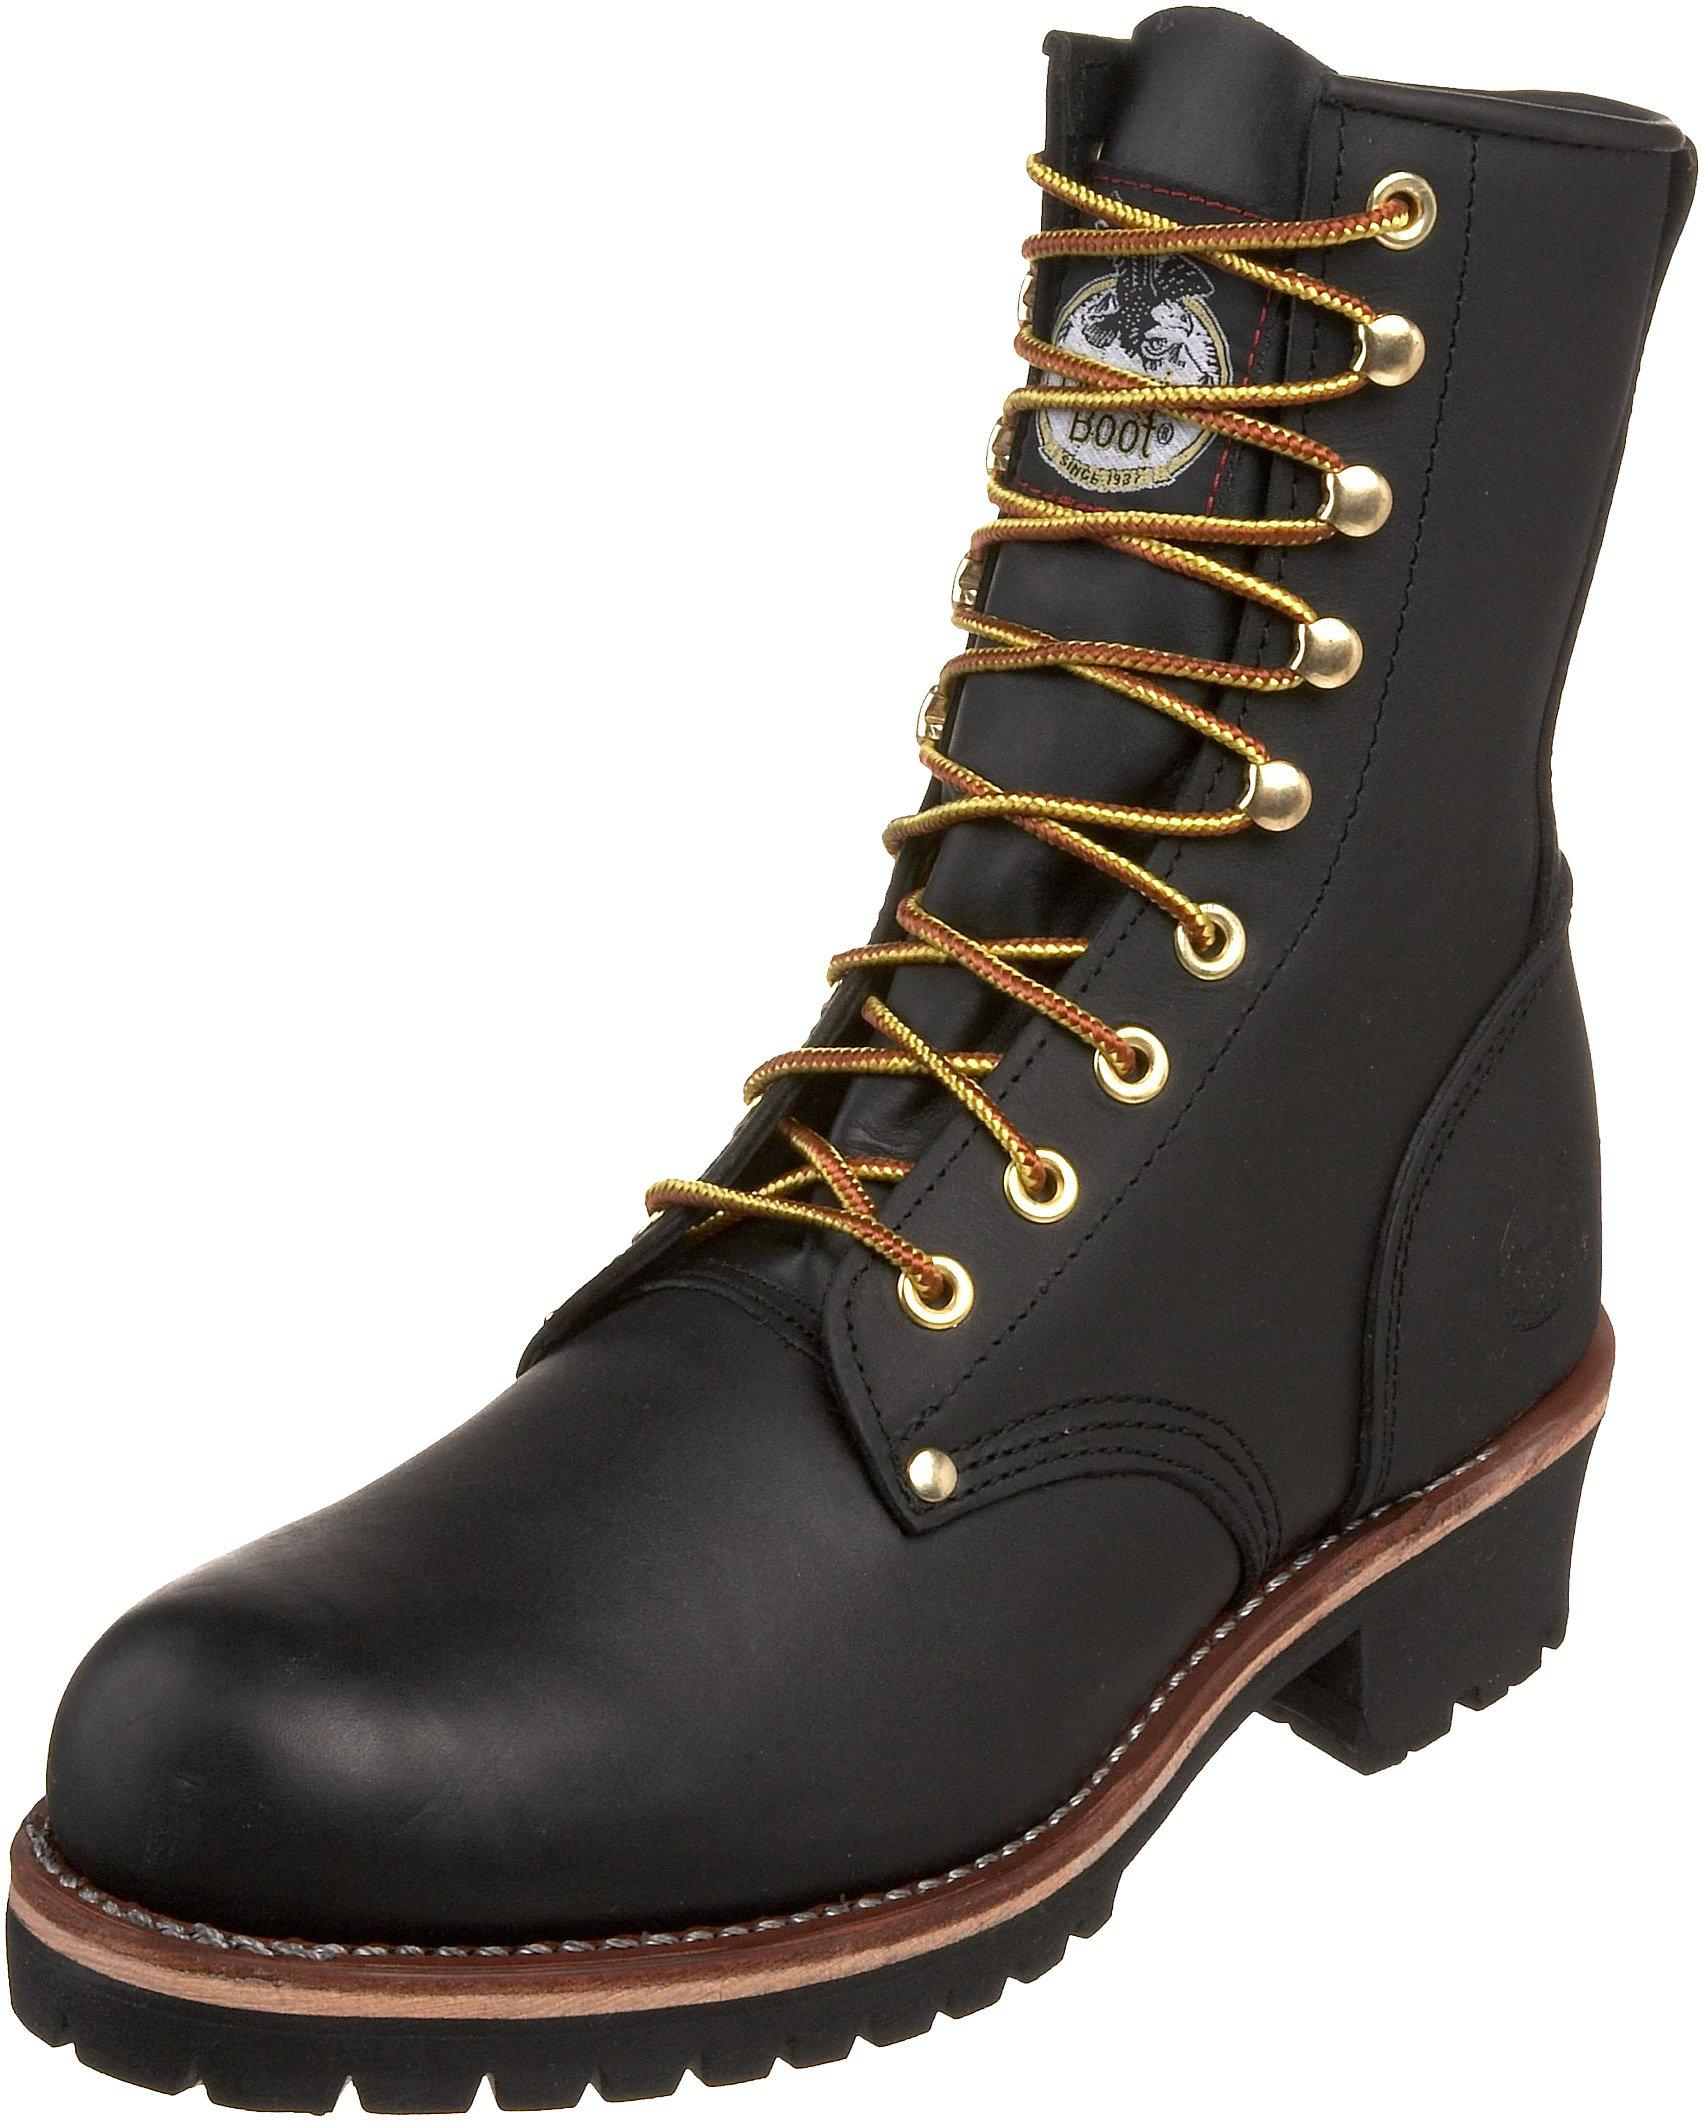 Georgia Boot Men's Logger 8'' Black Non Steel,Oily Black,5 M US by Georgia Boot (Image #1)